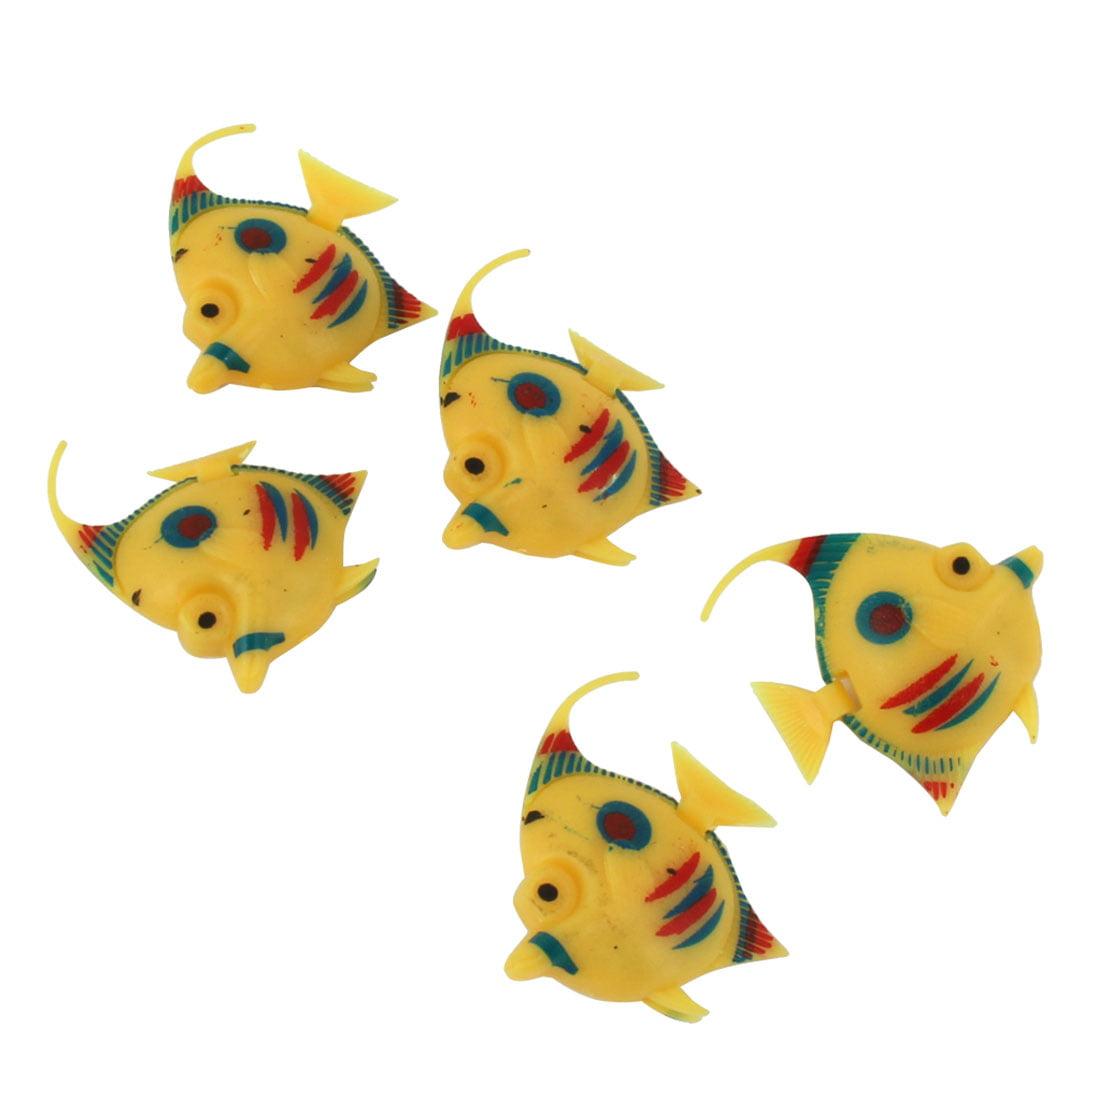 Aquarium Plastic Simulated Floating Fish Decoration Ornament Yellow 5pcs